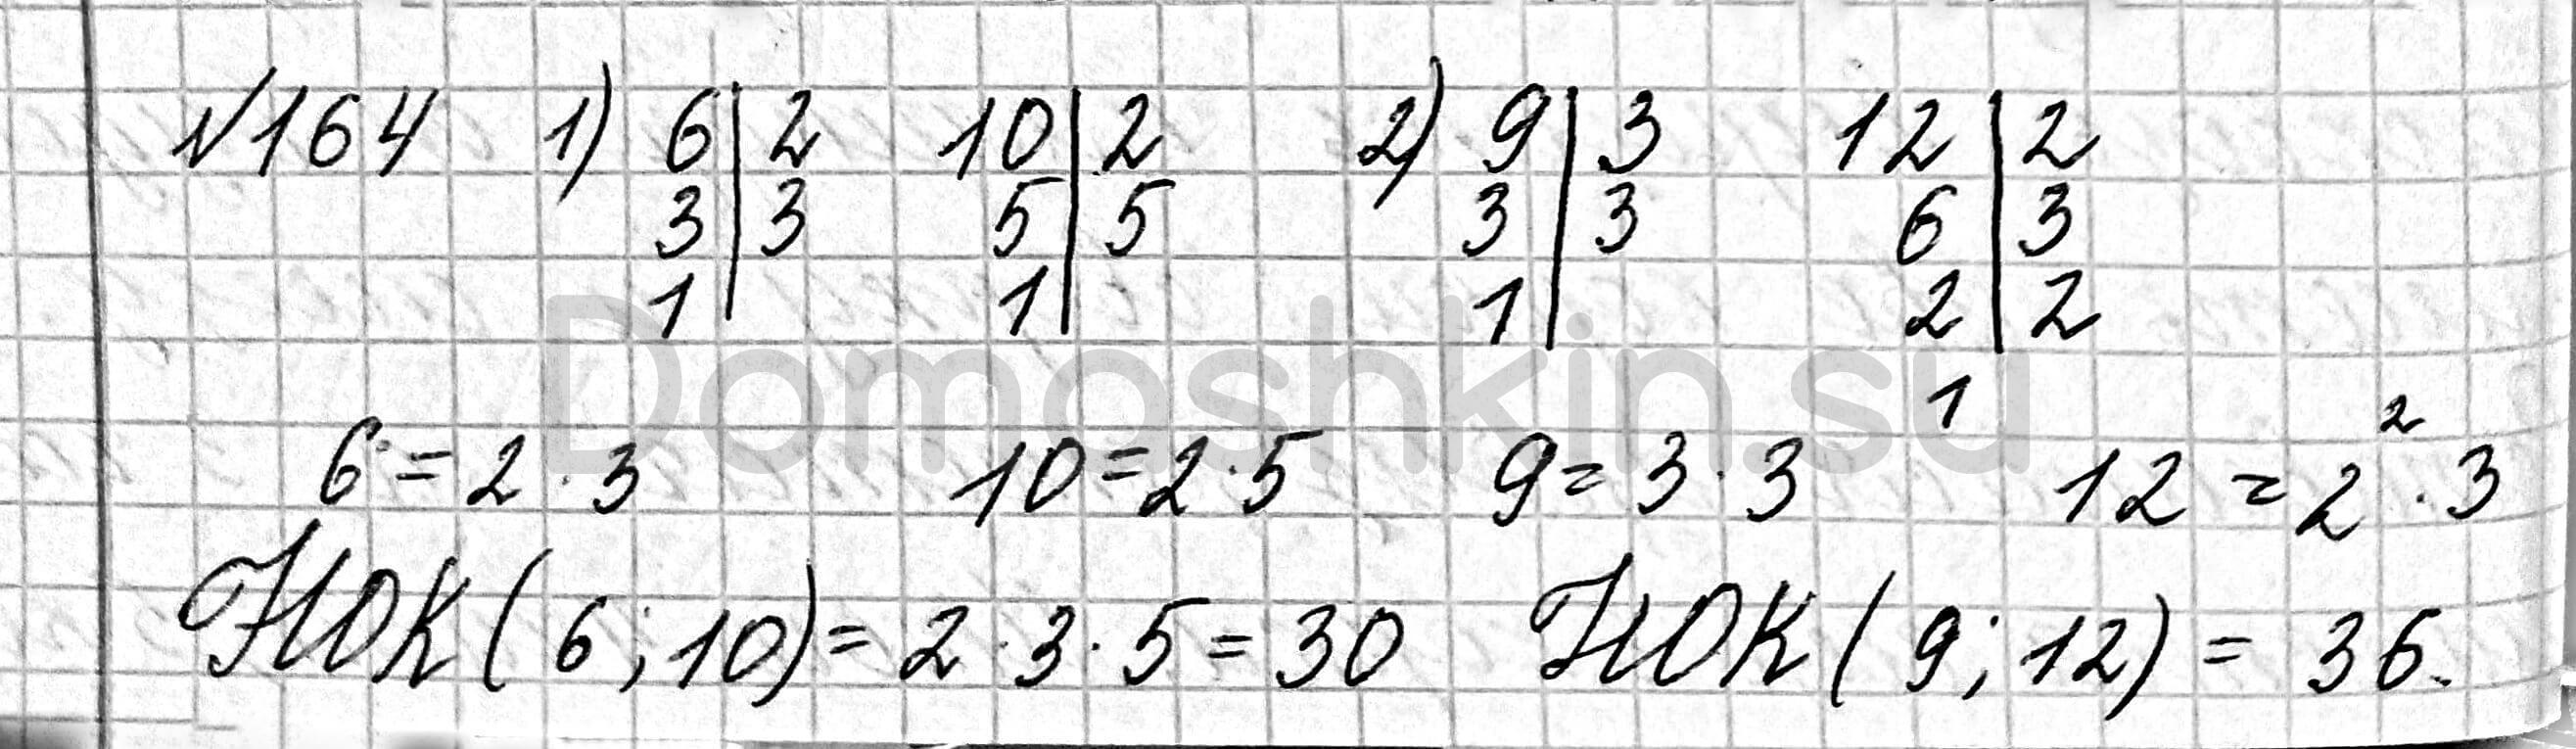 Математика 6 класс учебник Мерзляк номер 164 решение